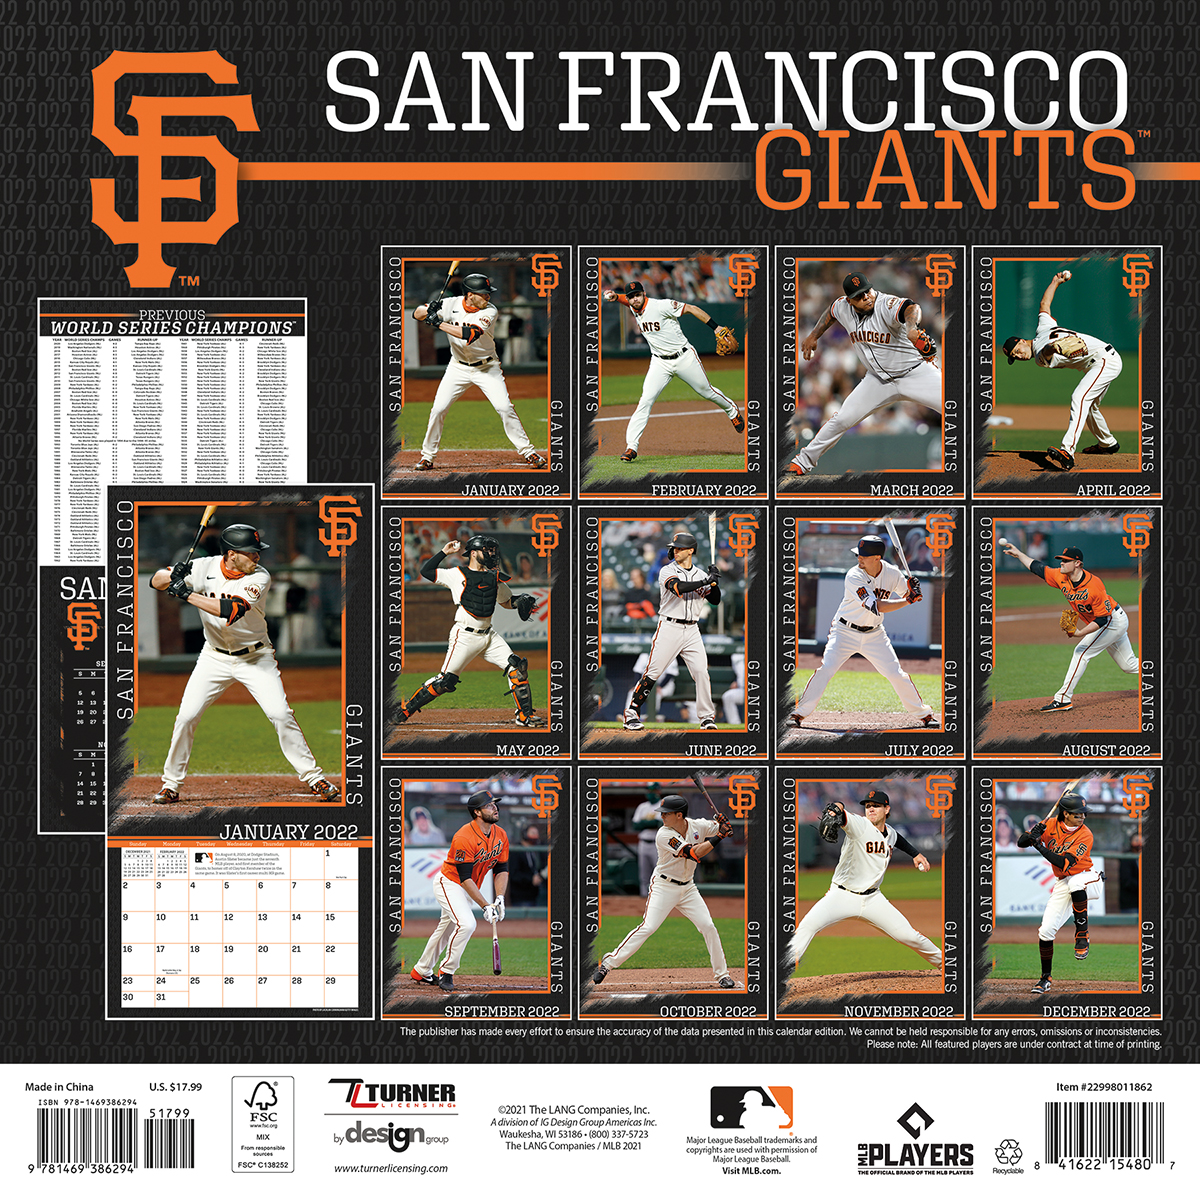 San Francisco Giants 2019 Wall Calendar Buy At Khc Sports